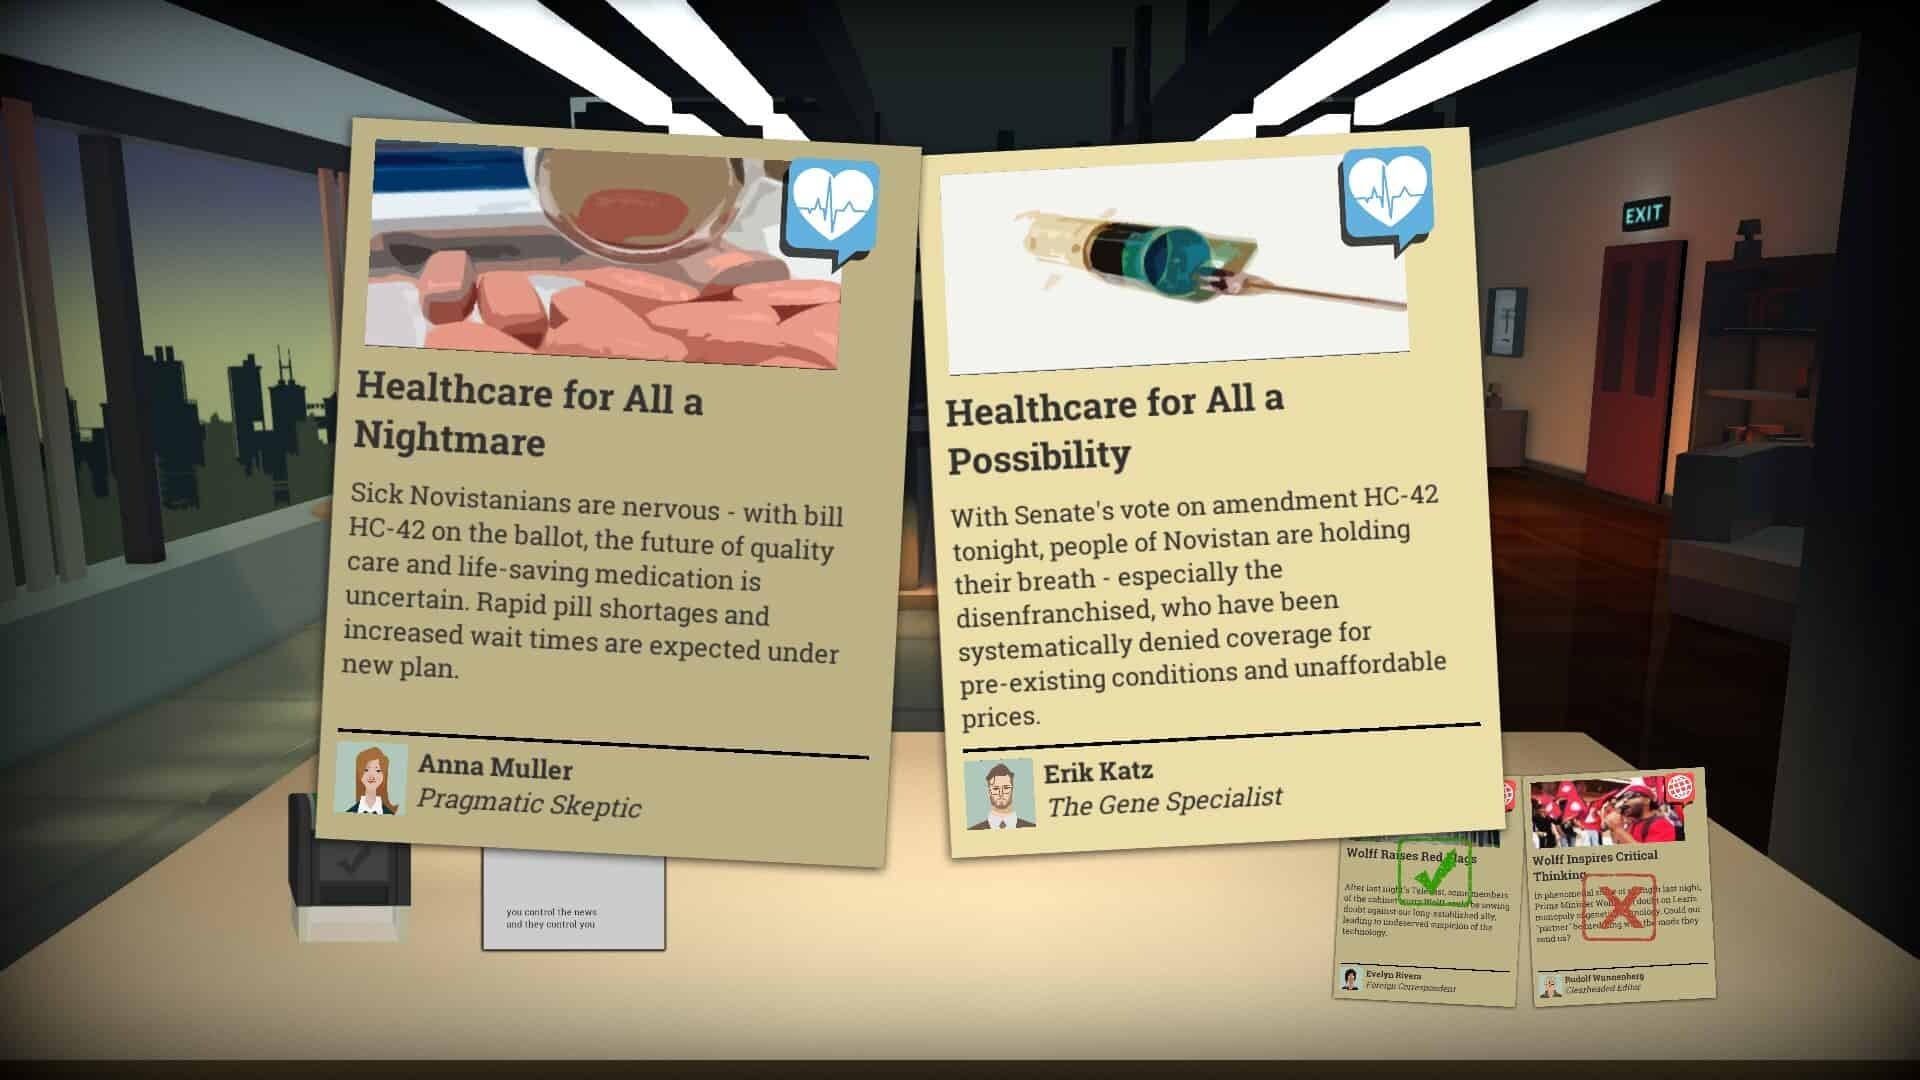 Headliner: NoviNews game screenshot, choosing news articles